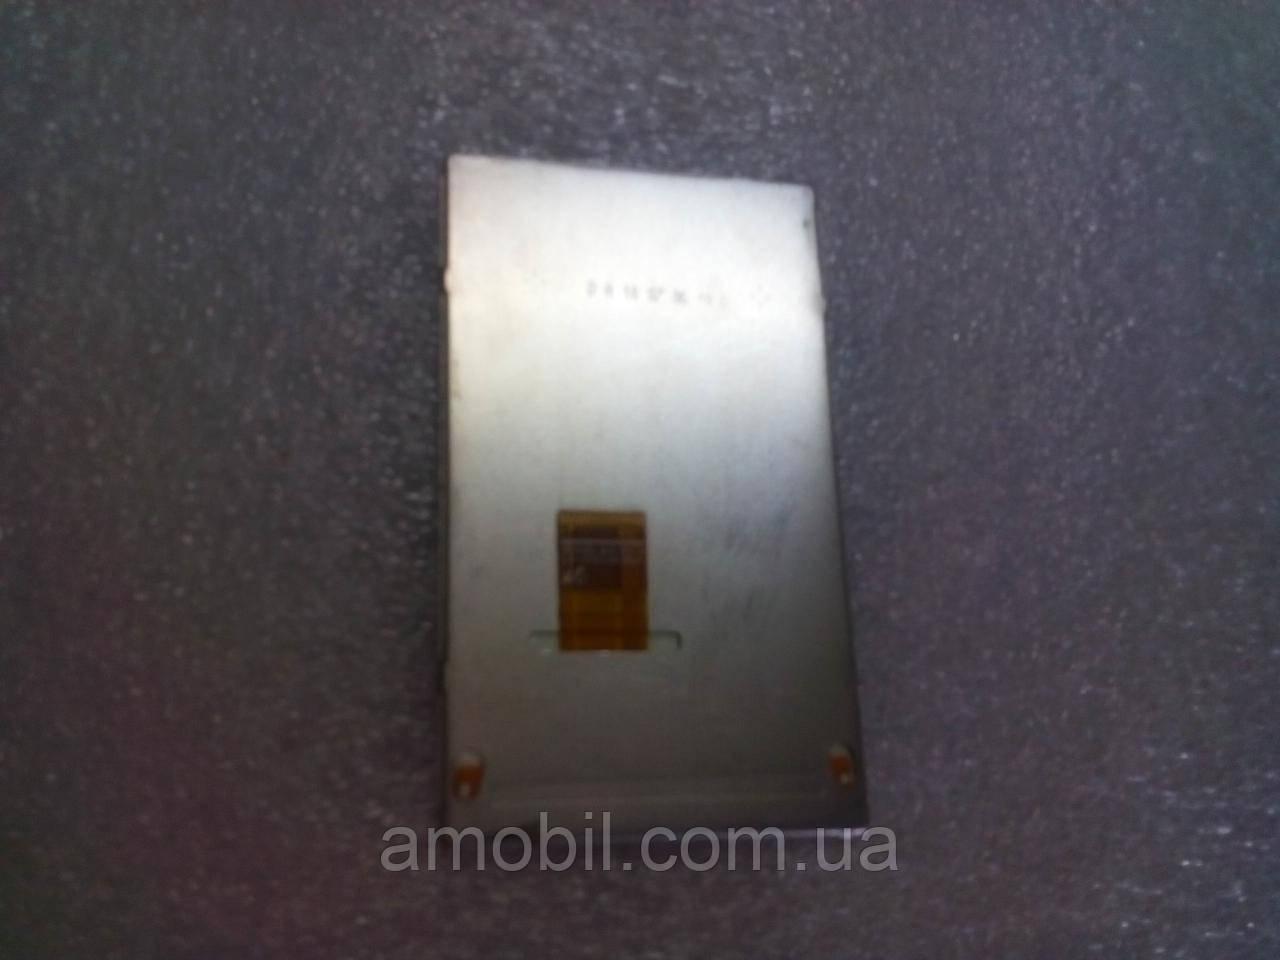 Дисплей Samsung S5230 orig